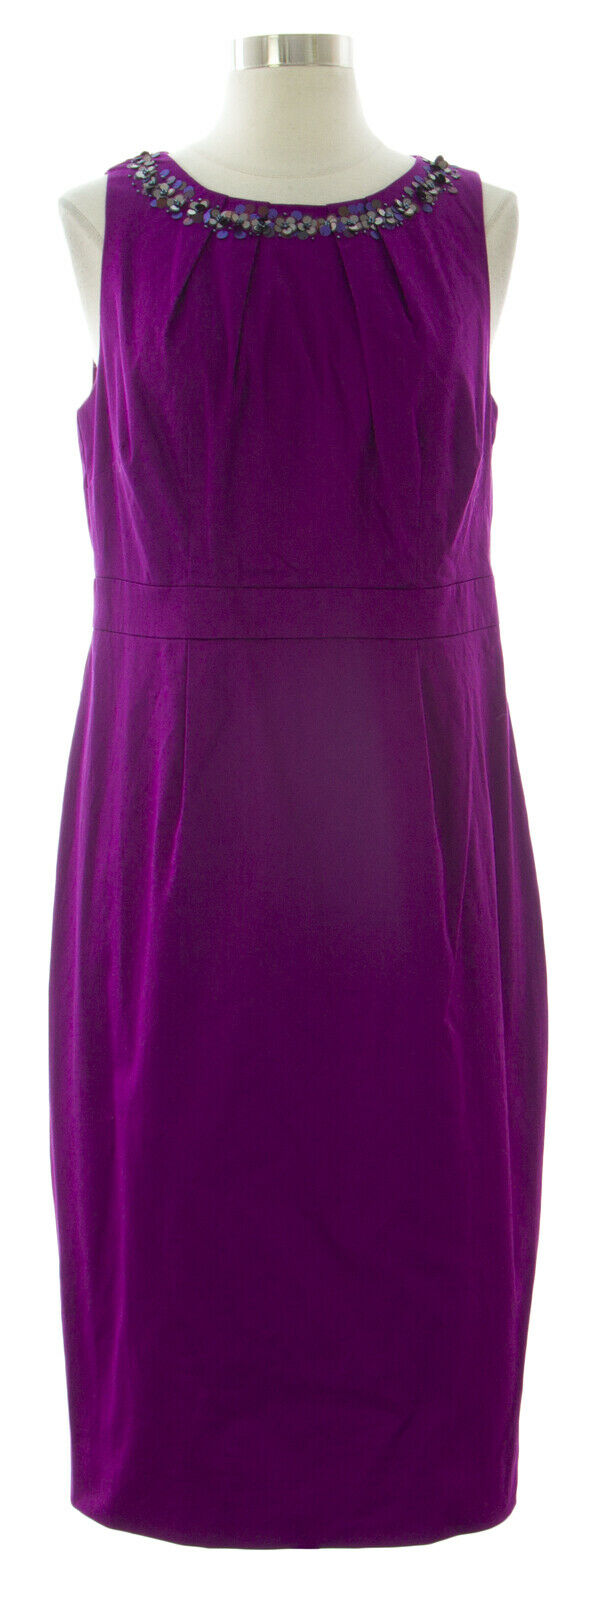 BODEN Woherren lila Knee Length Darcey Dress WH464 US Sz 8L  NWOT